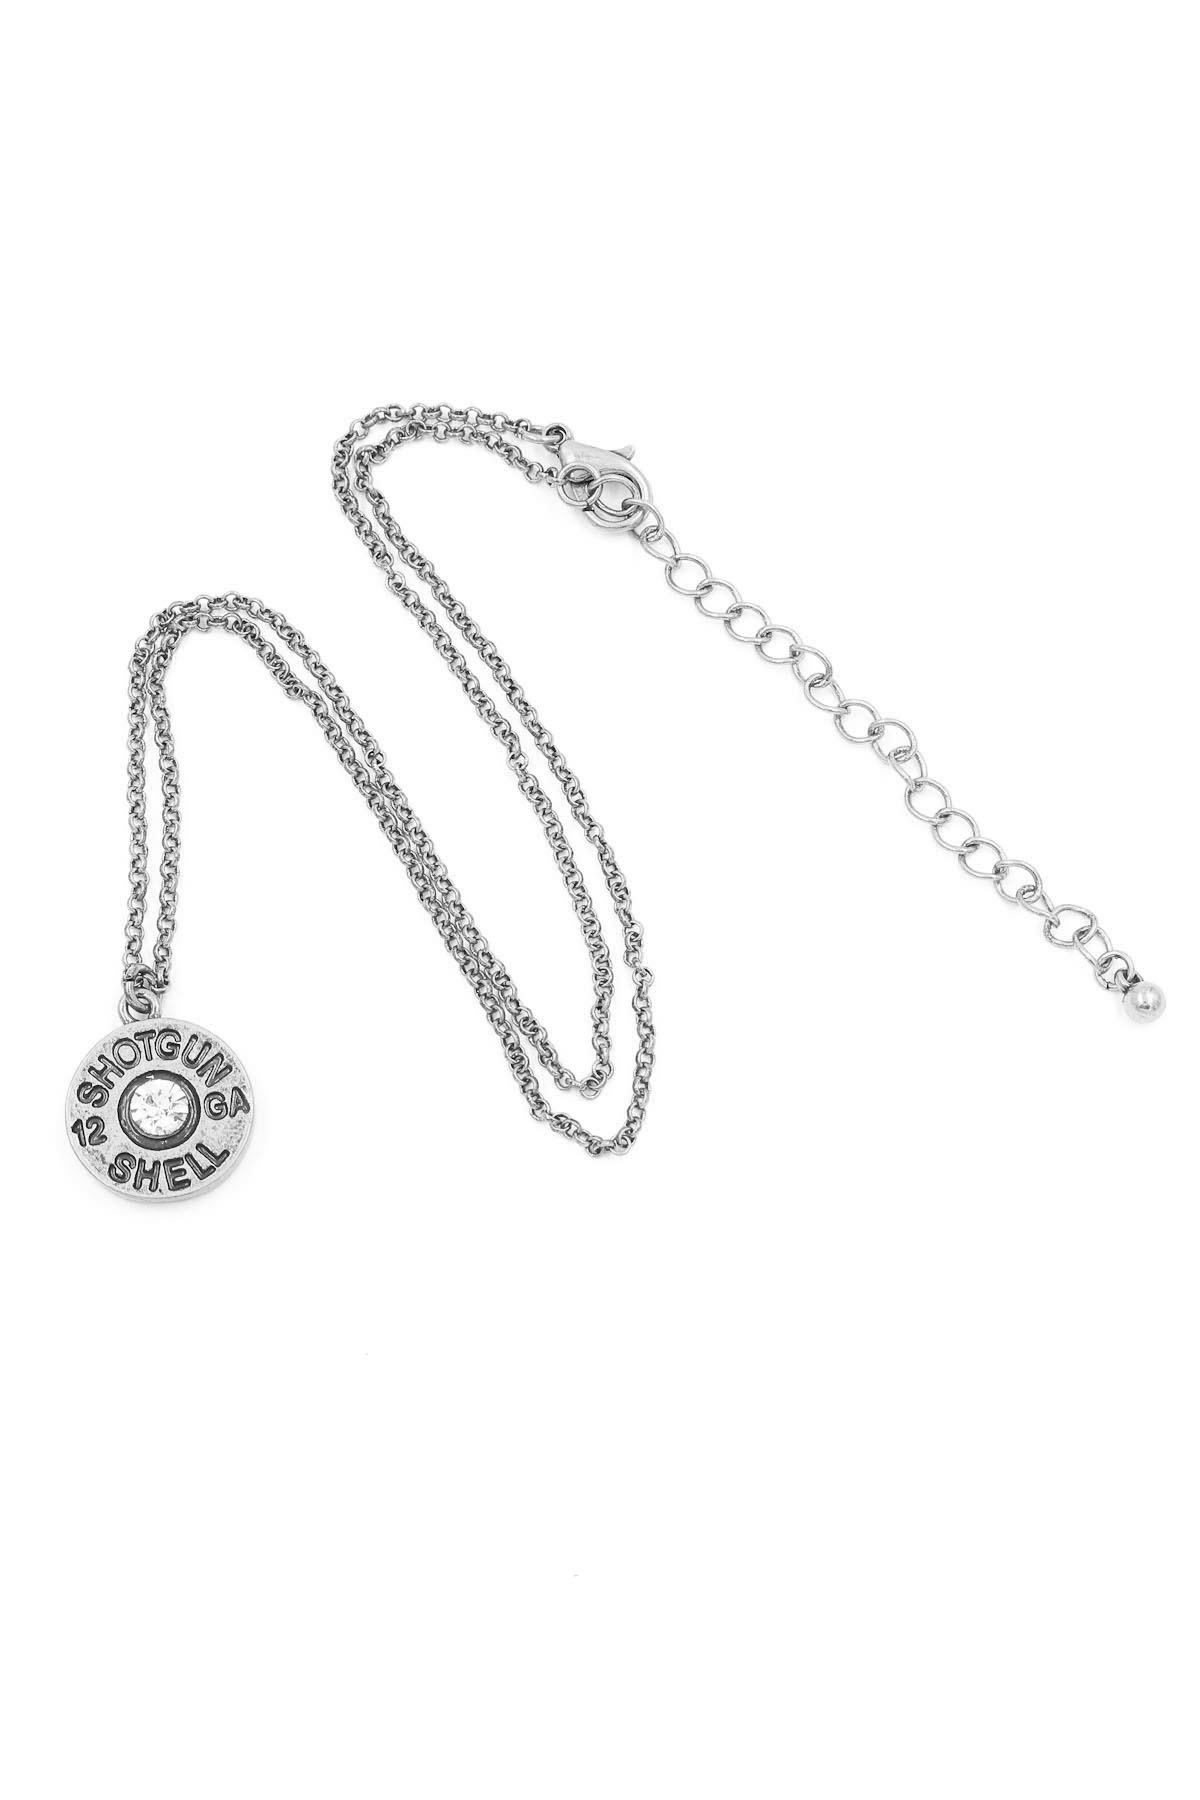 12 Gauge Shotgun Shell Necklace Set